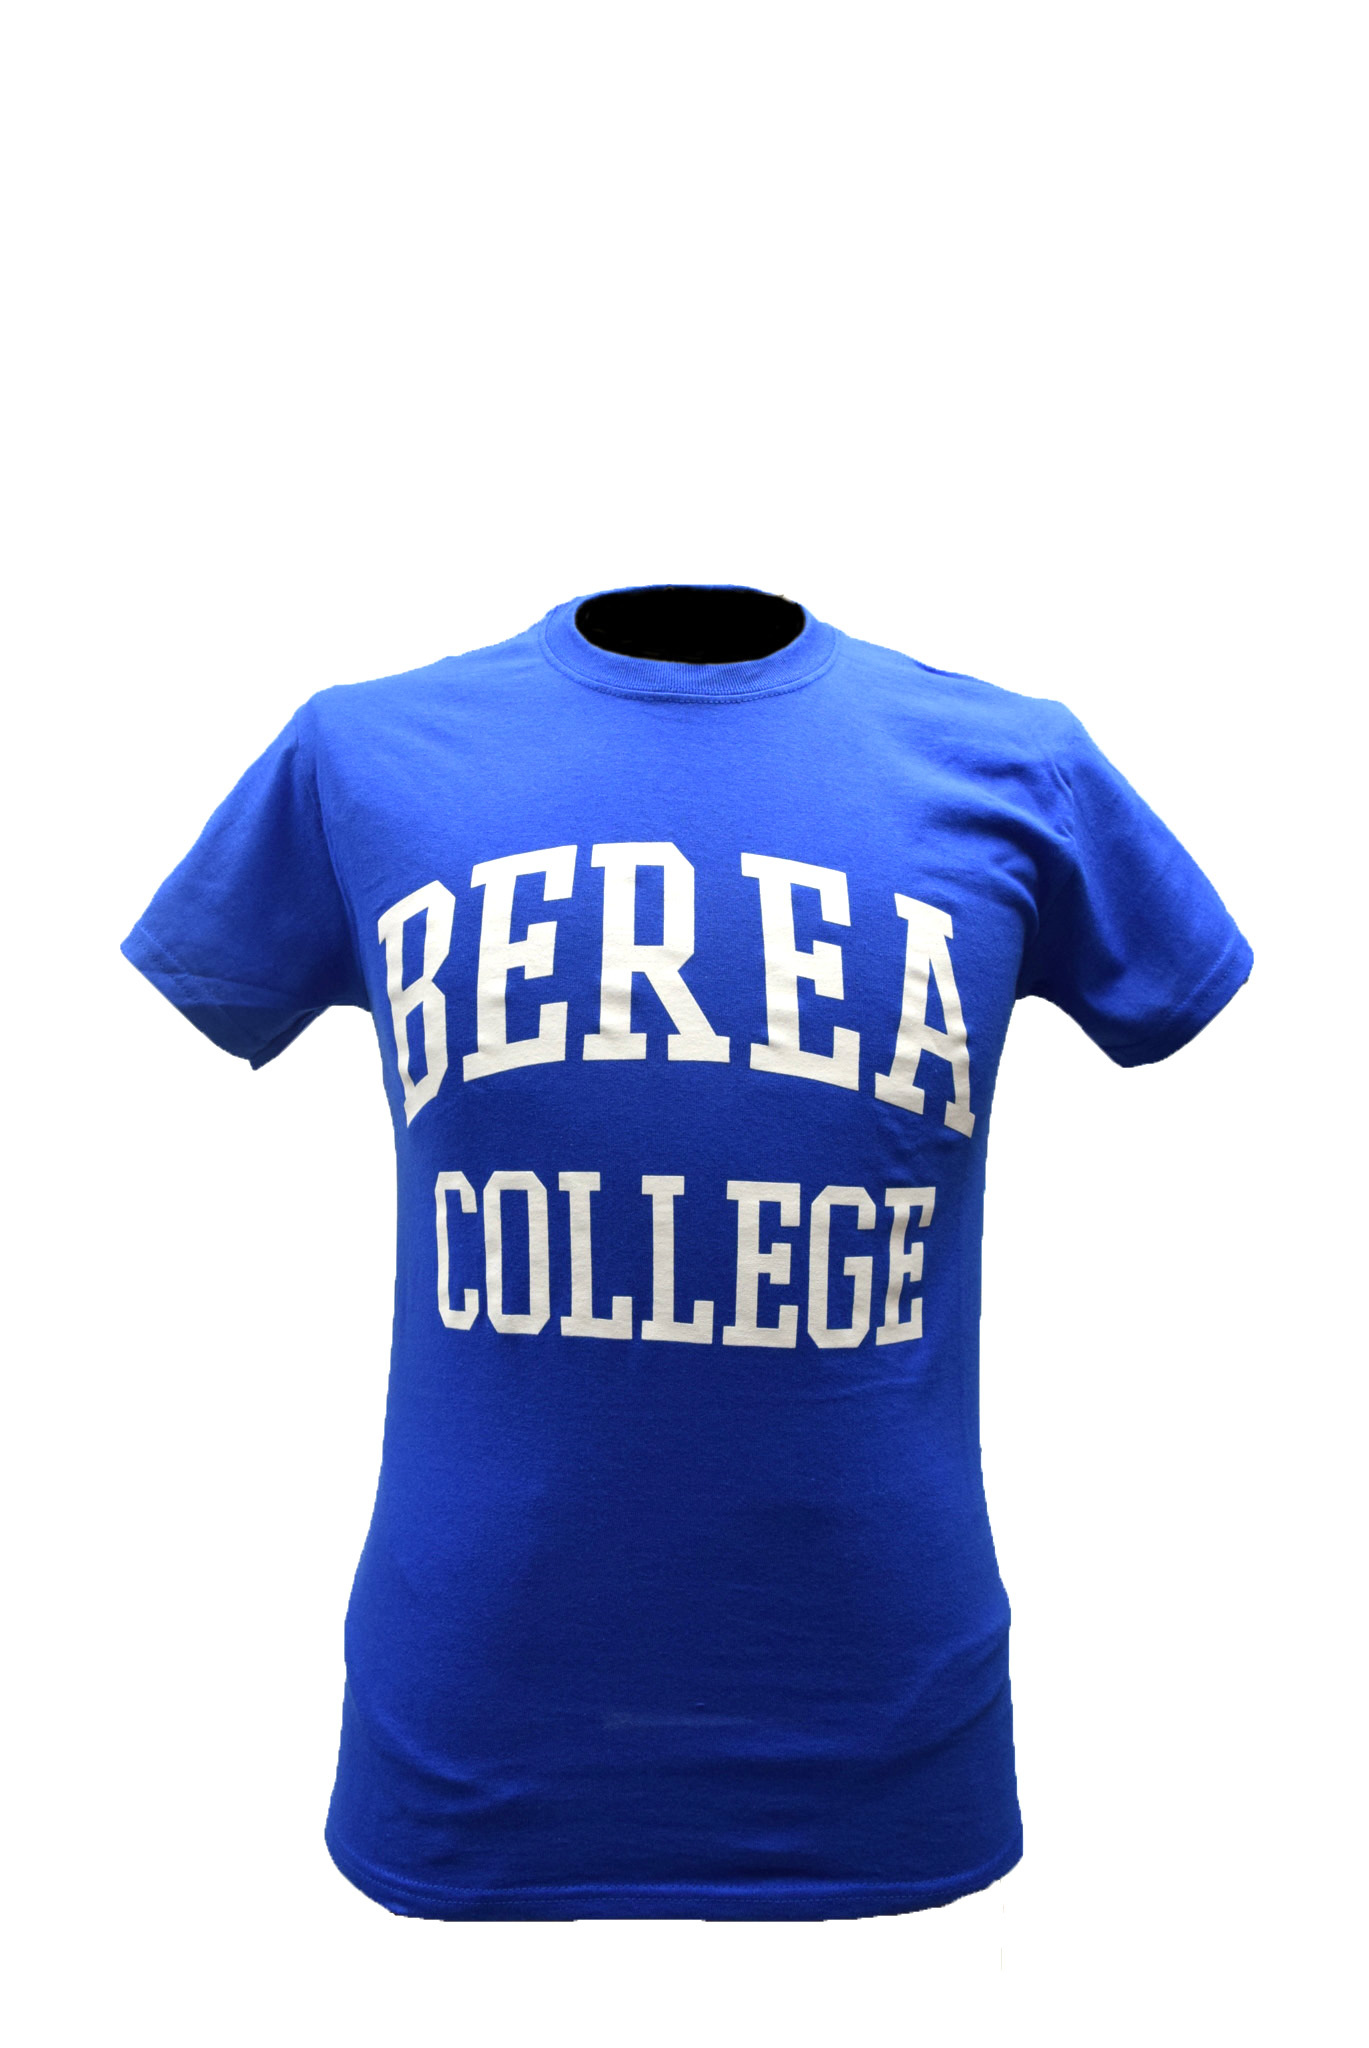 Berea College Classic T- Shirt-2